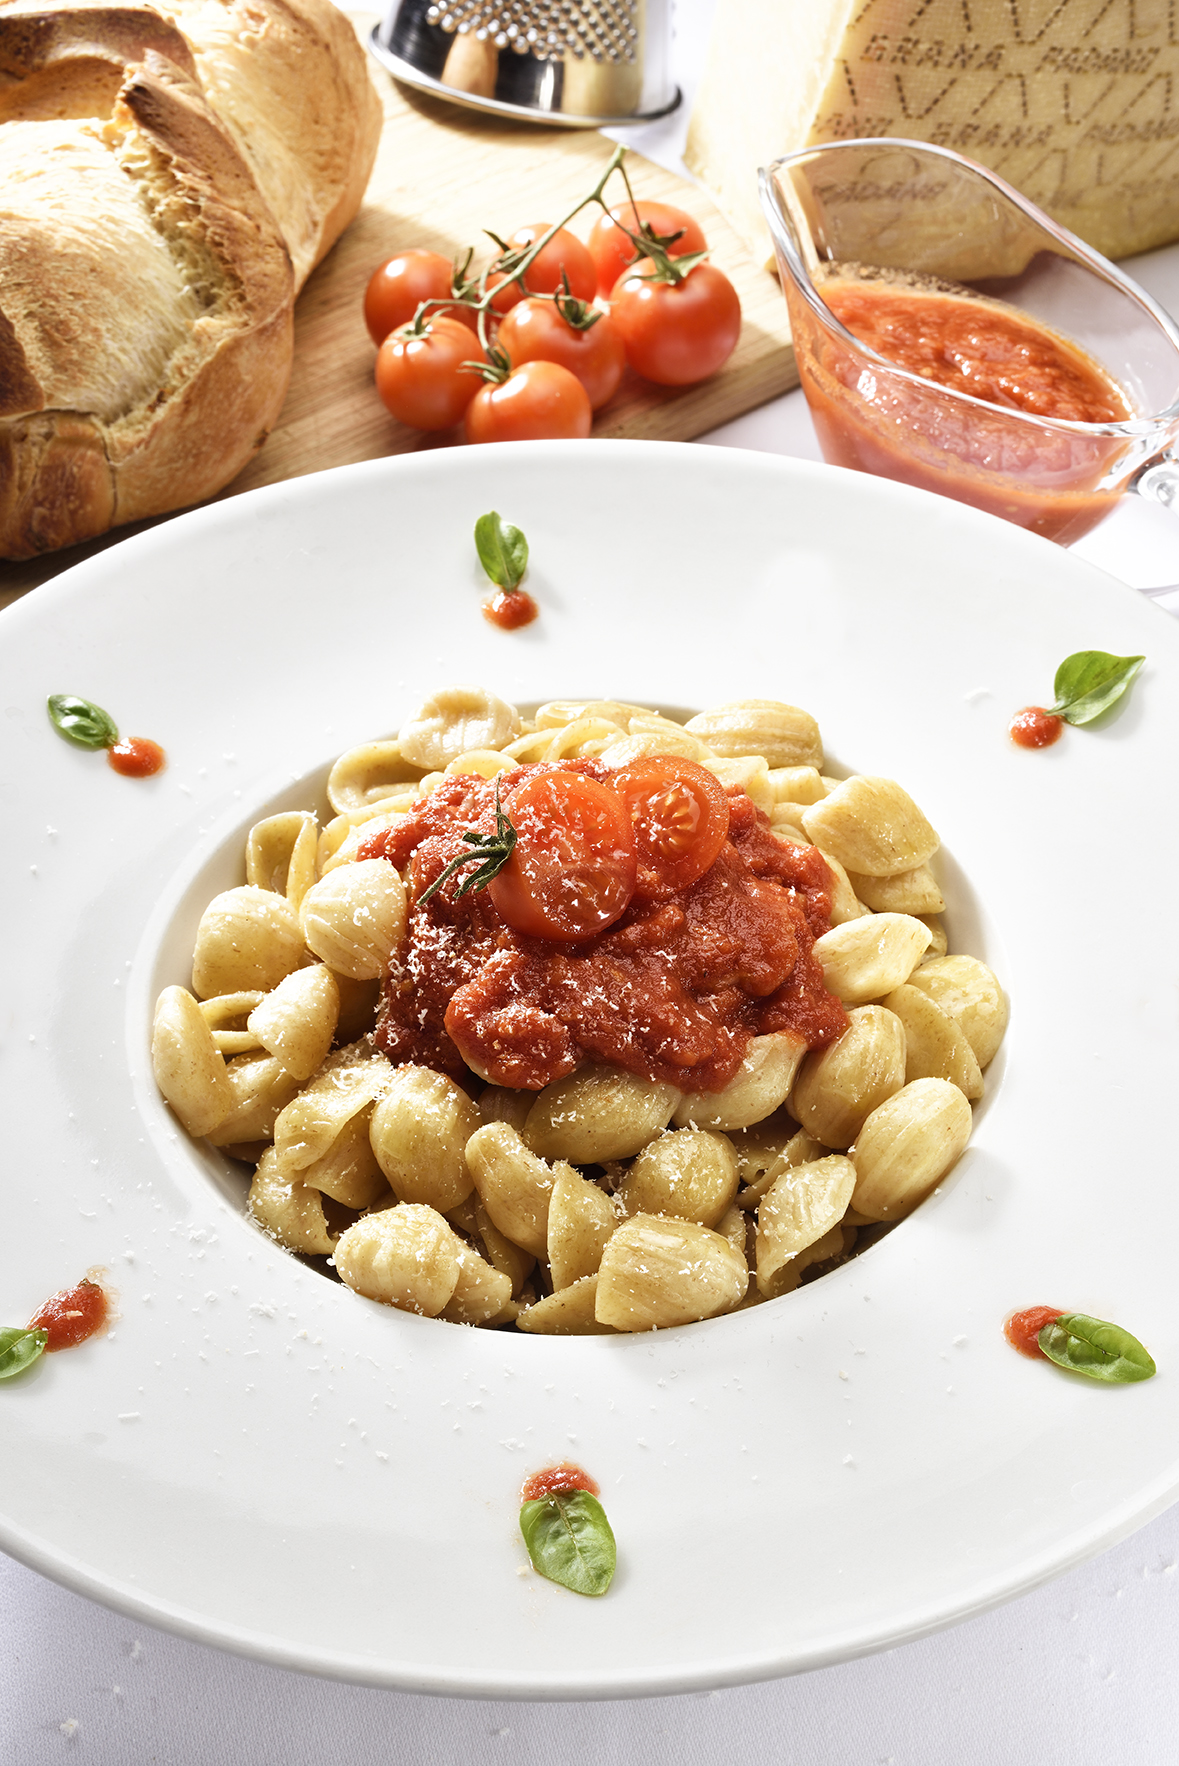 http://sandrorestaurante.com/wp-content/uploads/2017/01/piatto-265.jpg